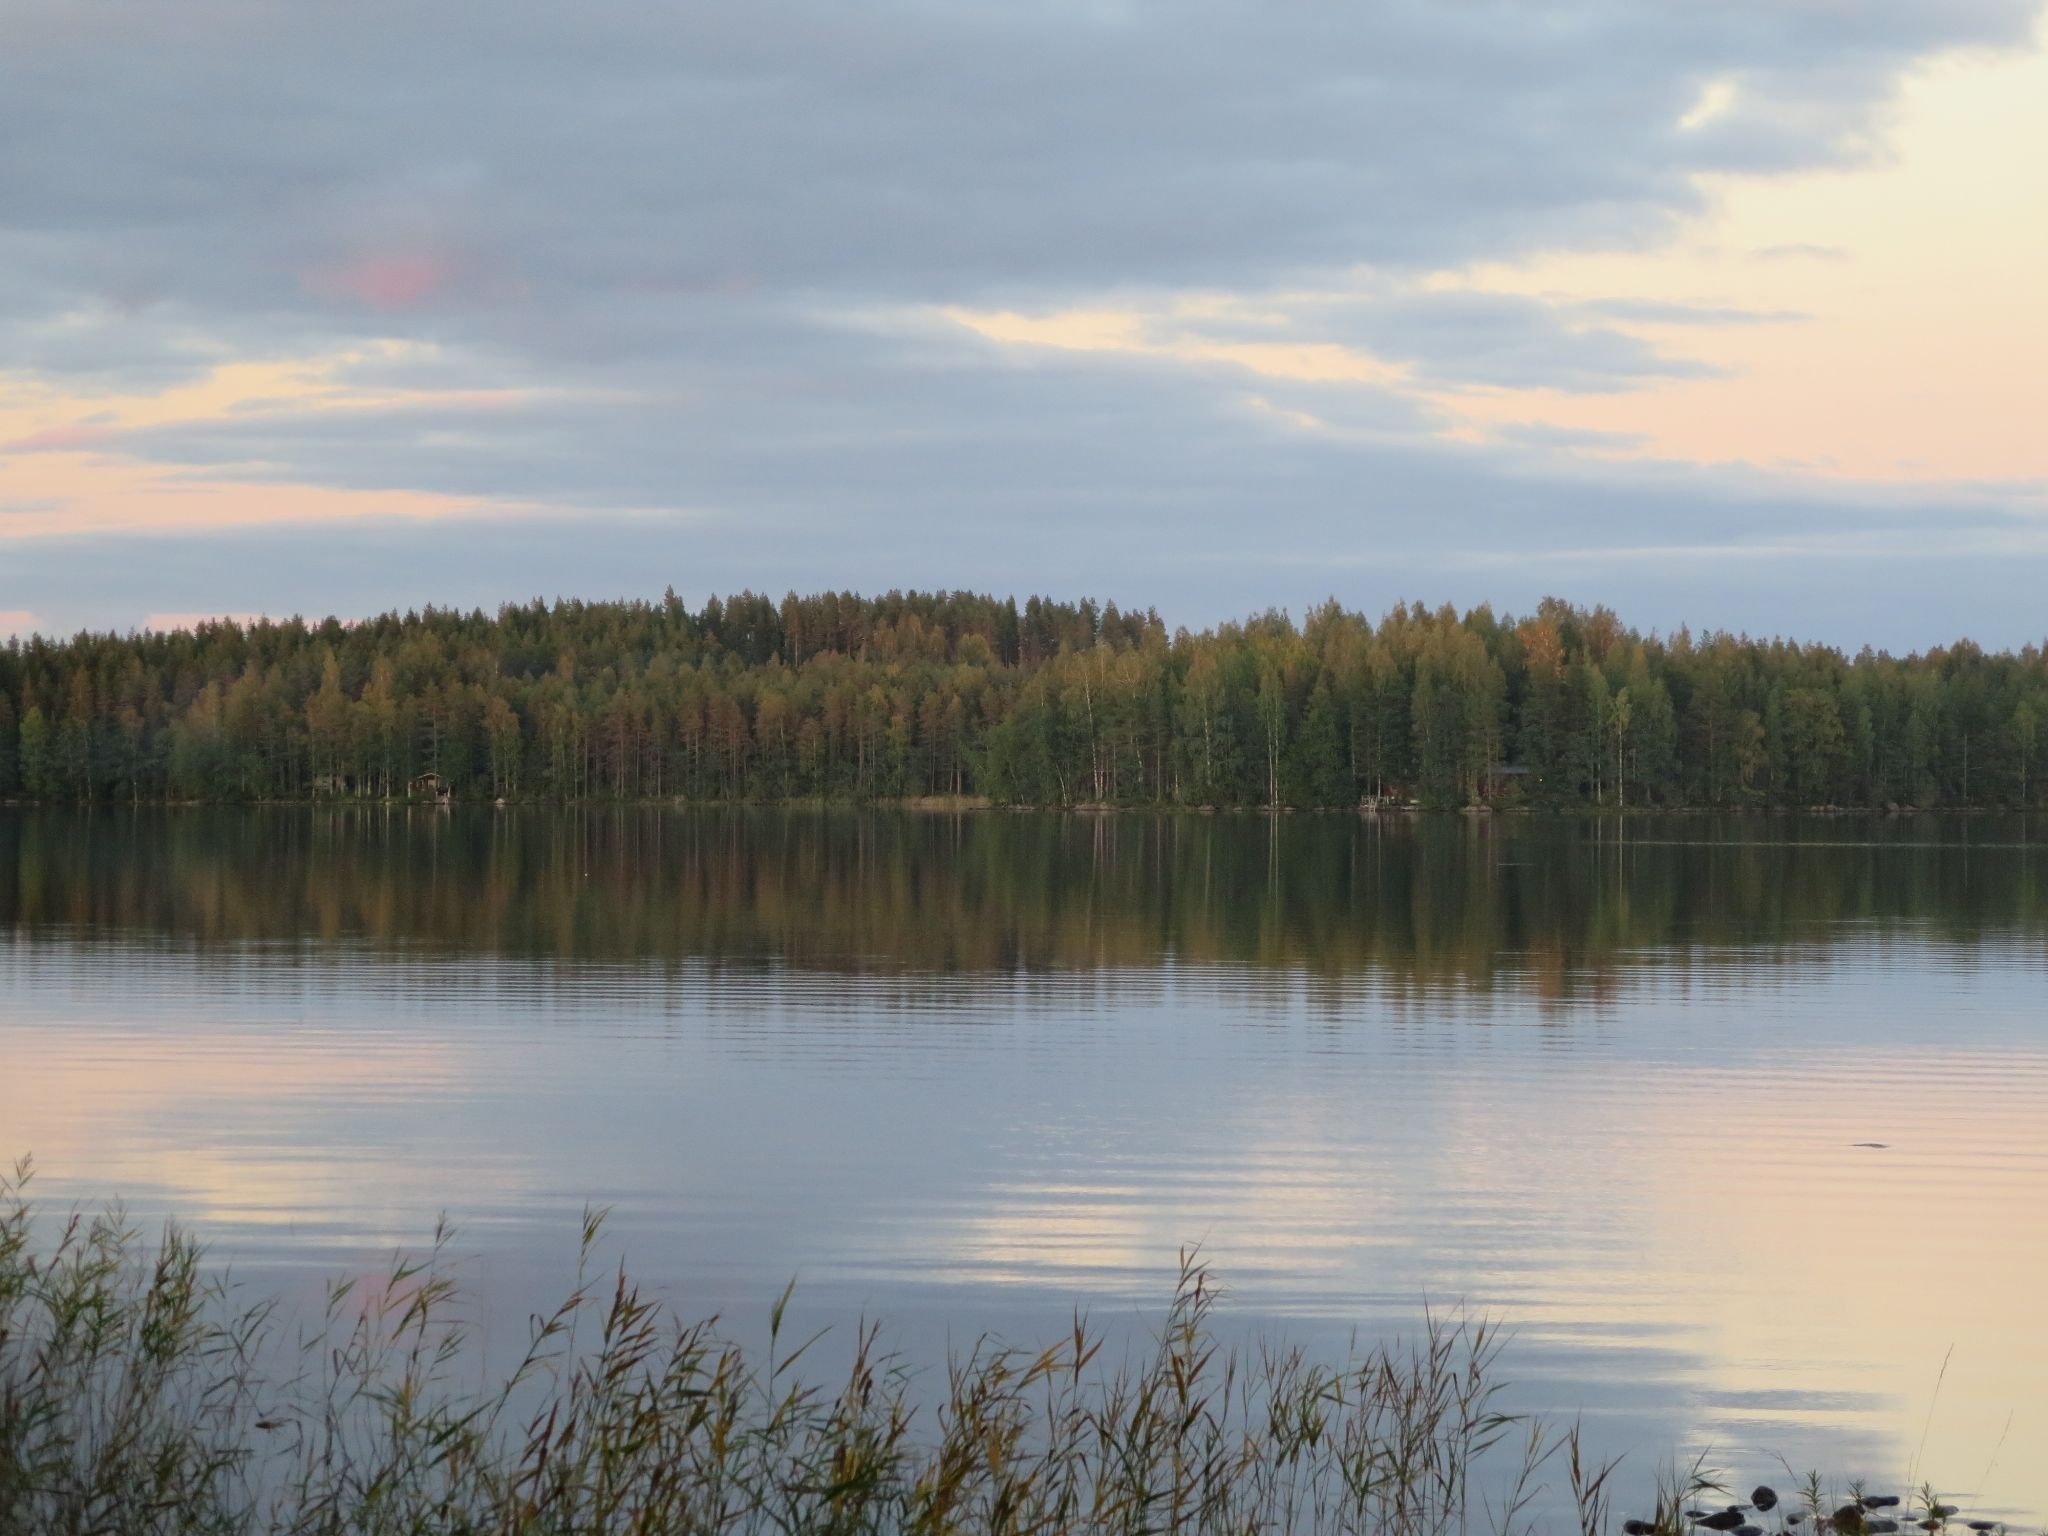 Finnish summer on lake by evasojahannele